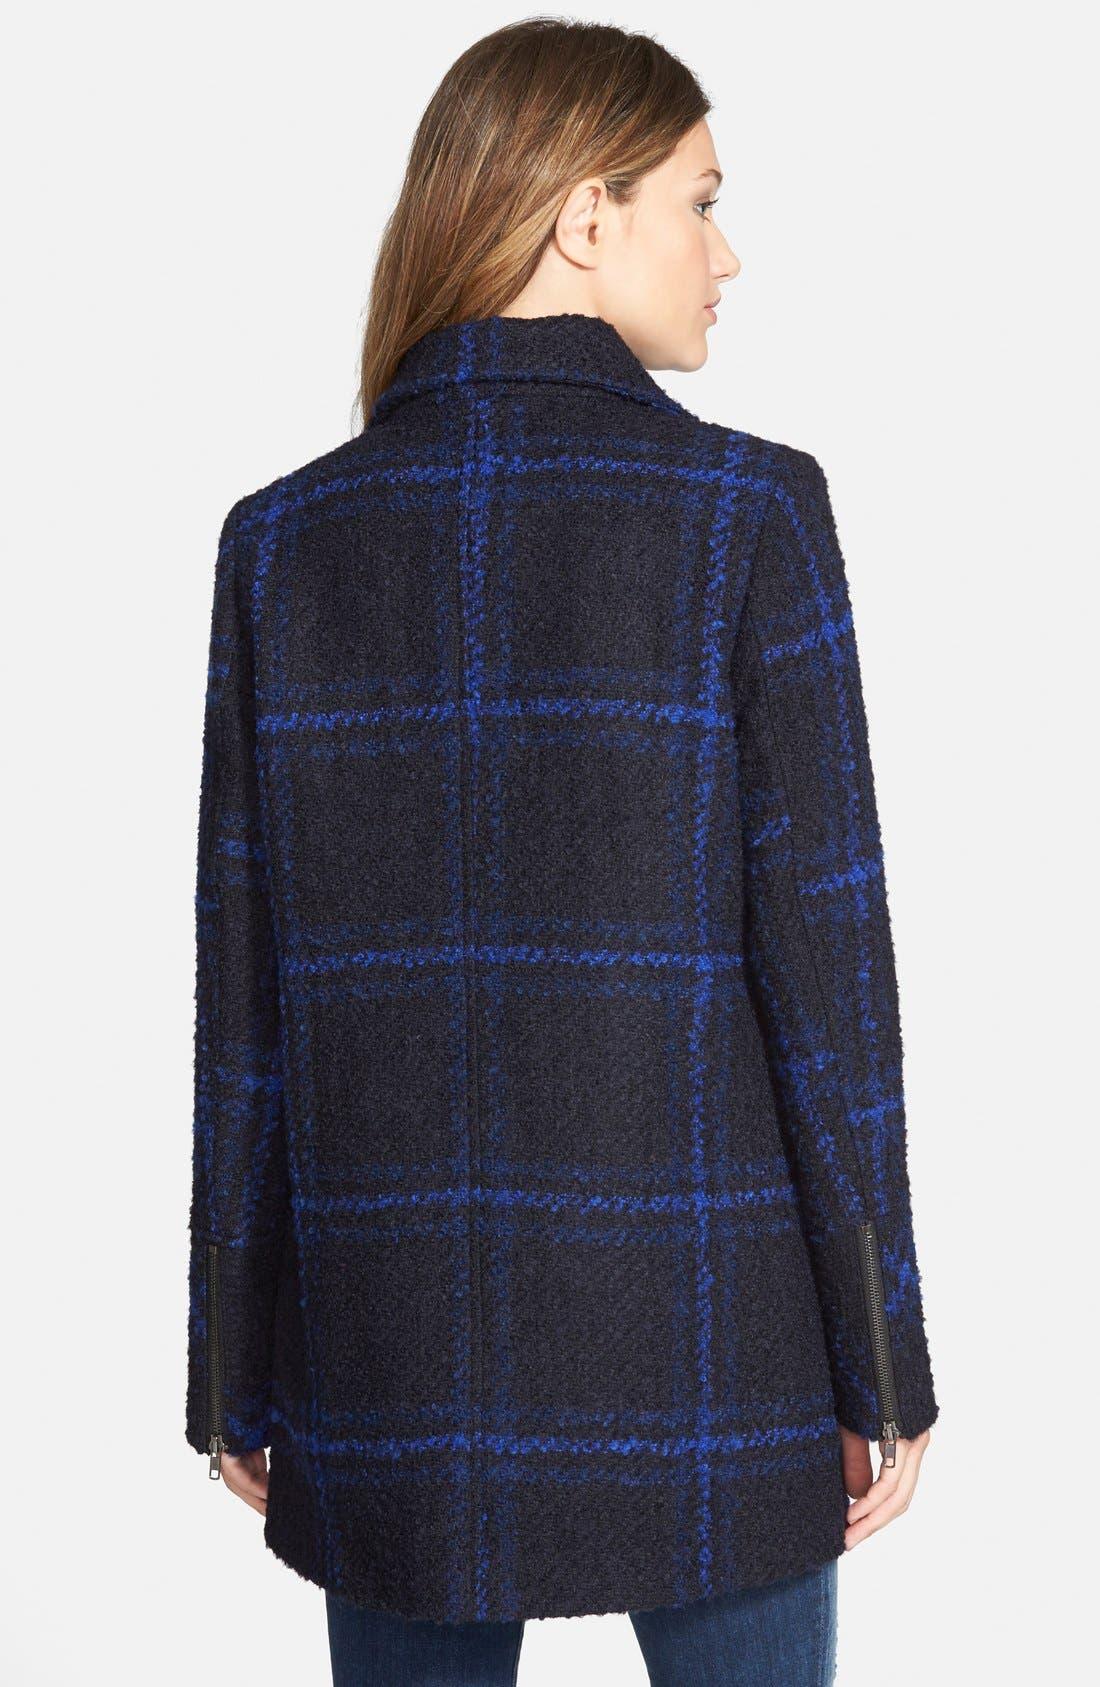 Alternate Image 2  - Maralyn & Me Plaid A-Line Jacket  (Online Only)